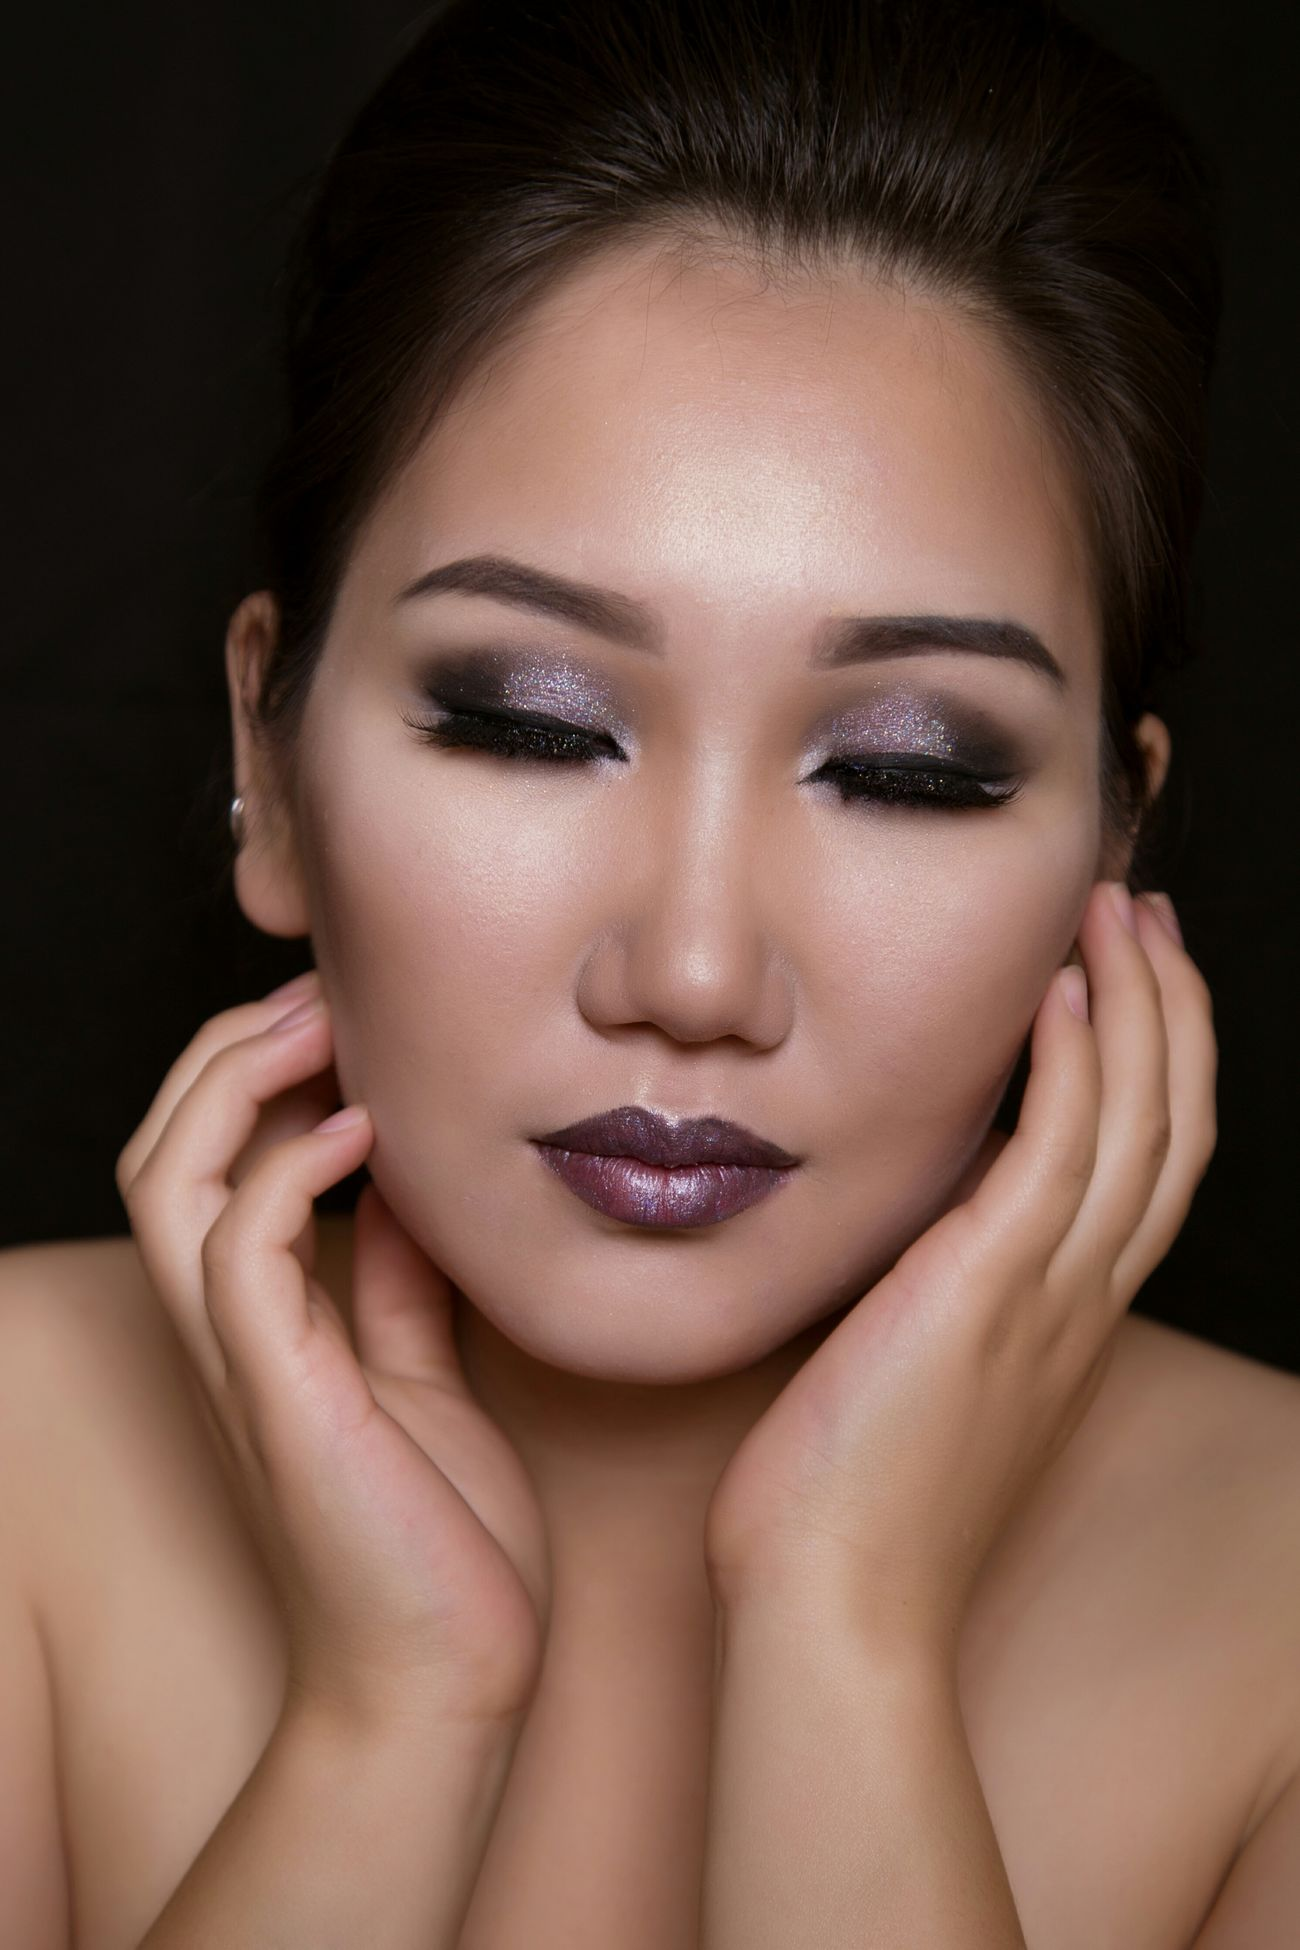 Portrait Of A Woman Portrait Photography Portrait Makeup Makeupartist Beauty Asian Girl Yakutiangirl